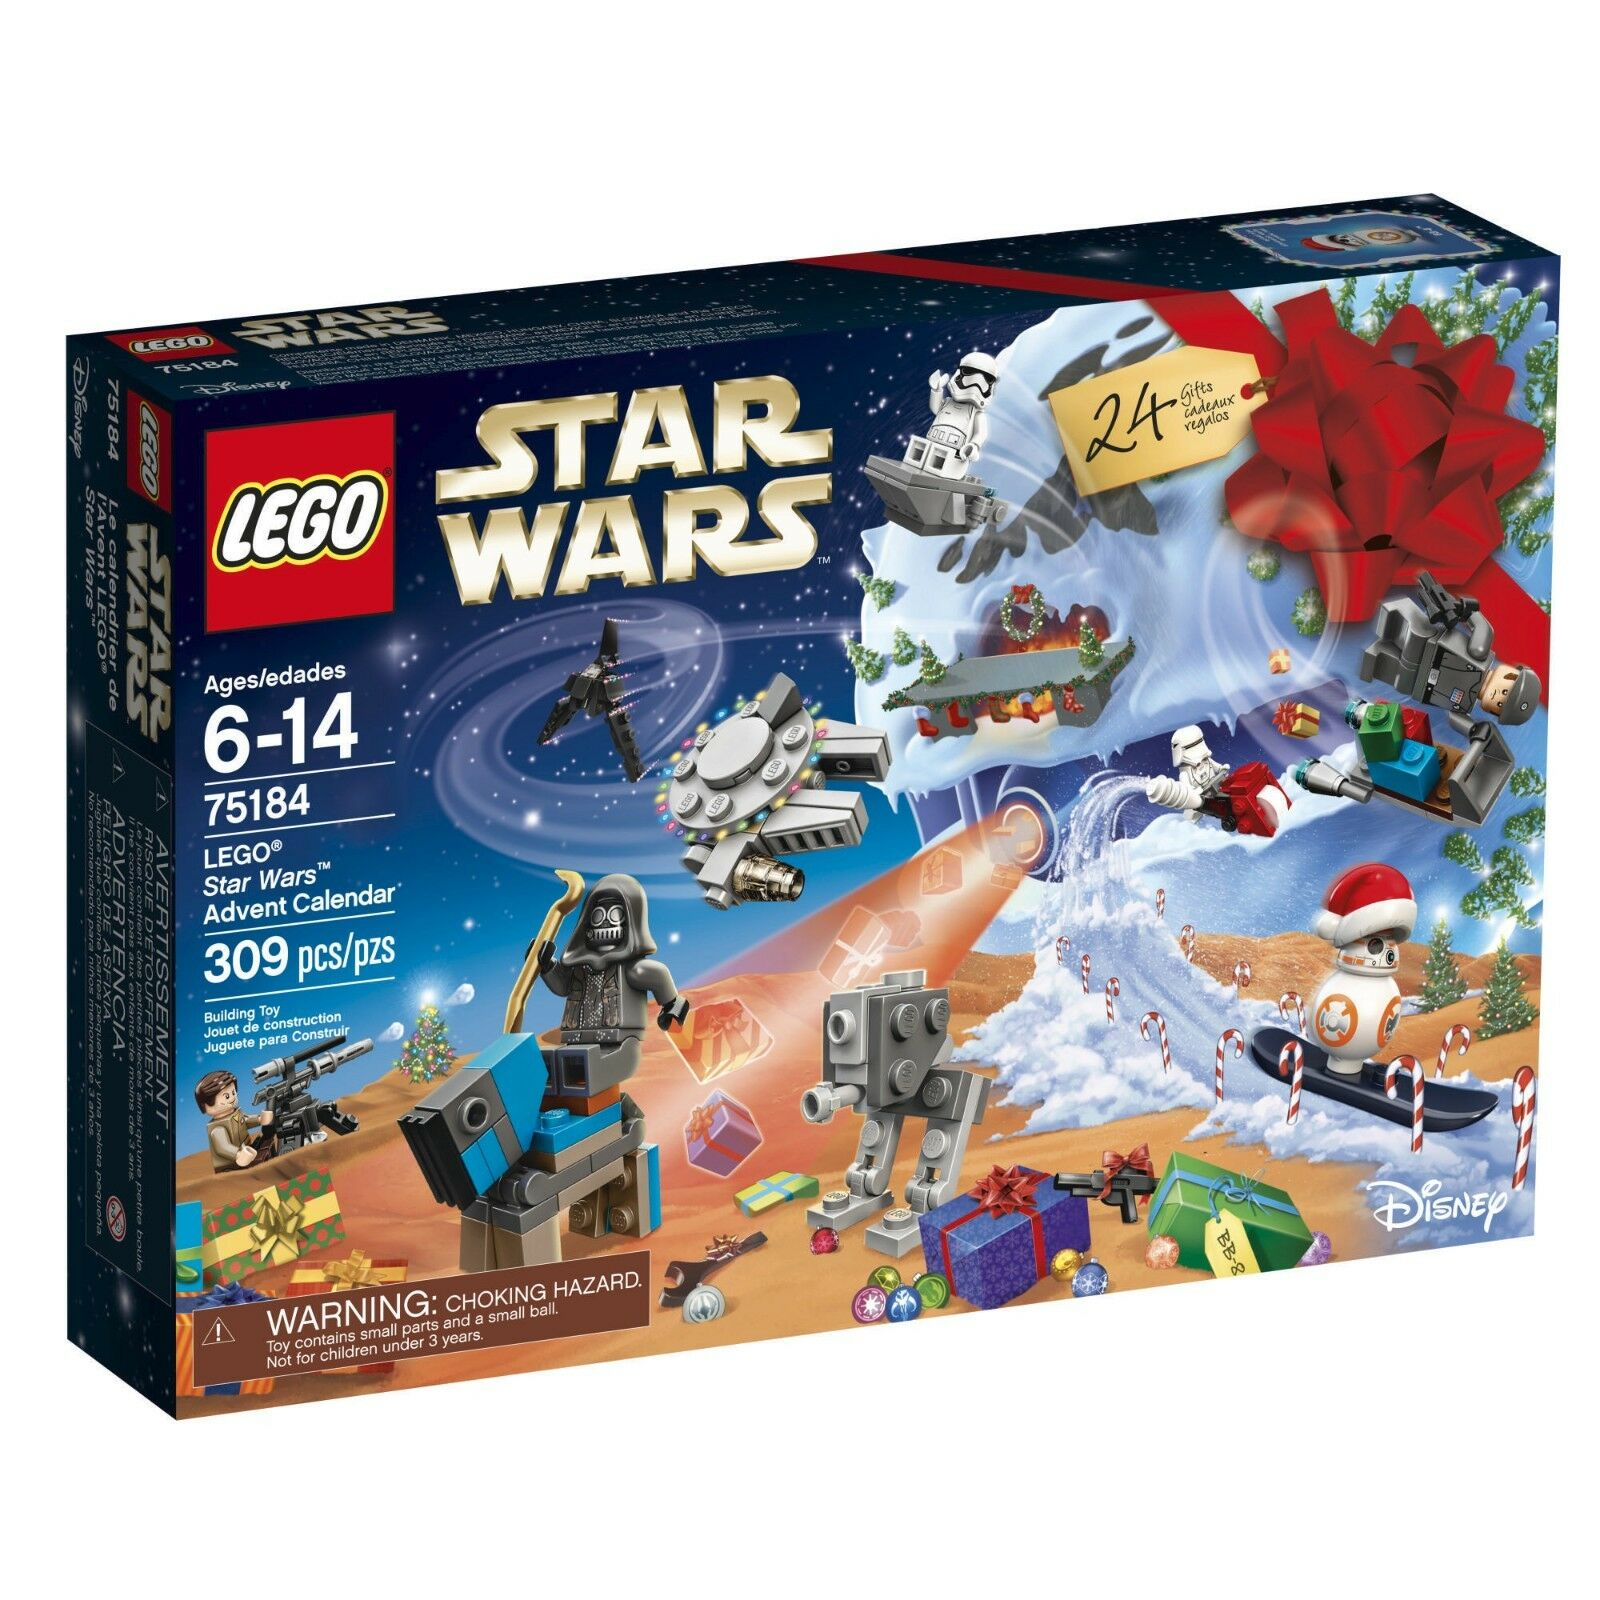 LEGO Star Wars Christmas Advent Calendar 2017 Set  75184